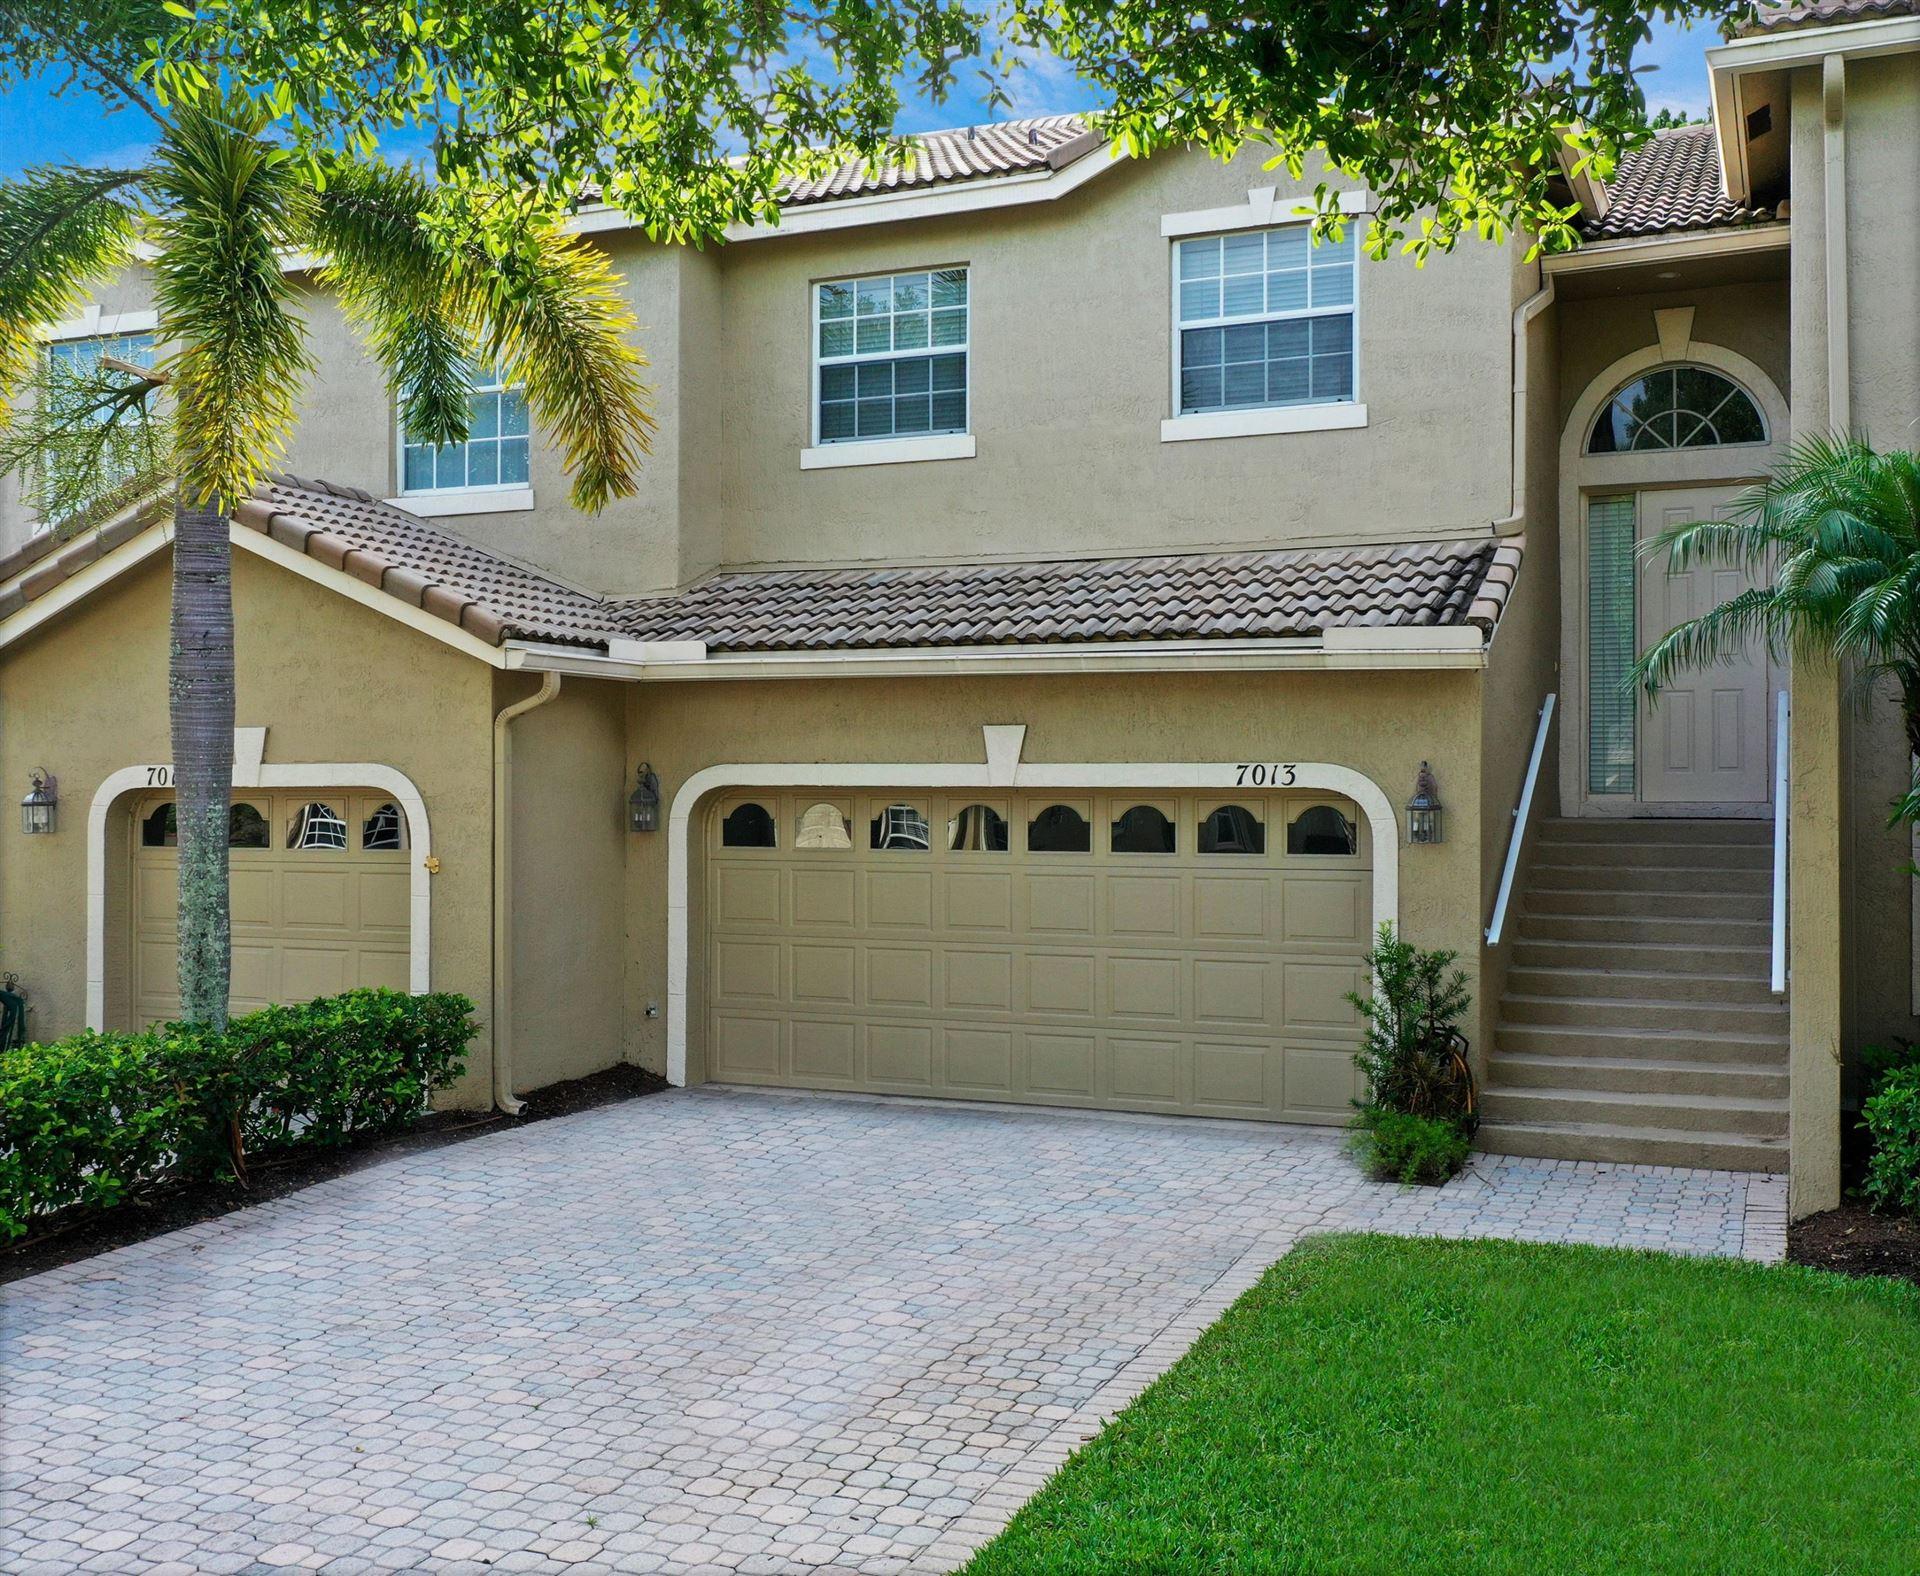 7013 Torrey Pines Circle, Port Saint Lucie, FL 34986 - MLS#: RX-10721034